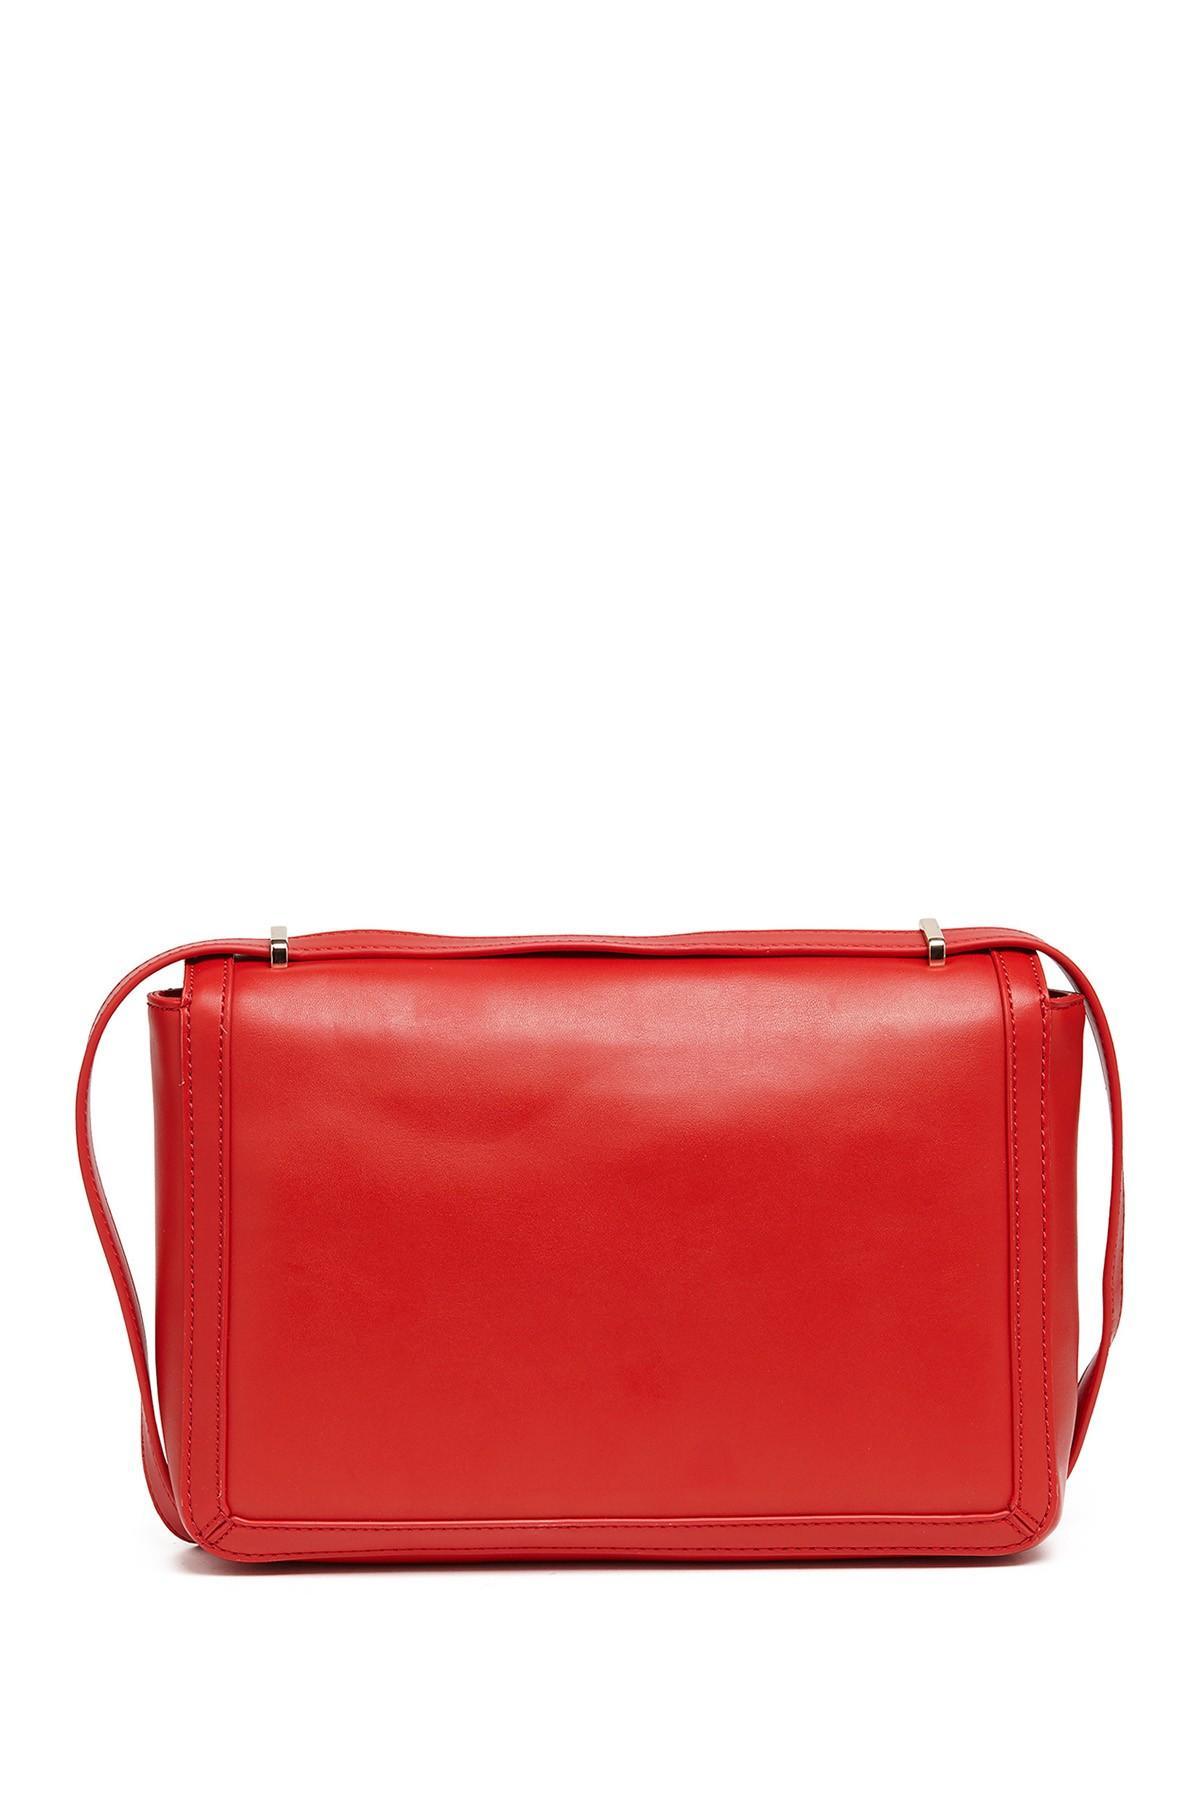 bfa437af61201 Love Moschino - Red Mirror Heart Shoulder Bag - Lyst. View fullscreen